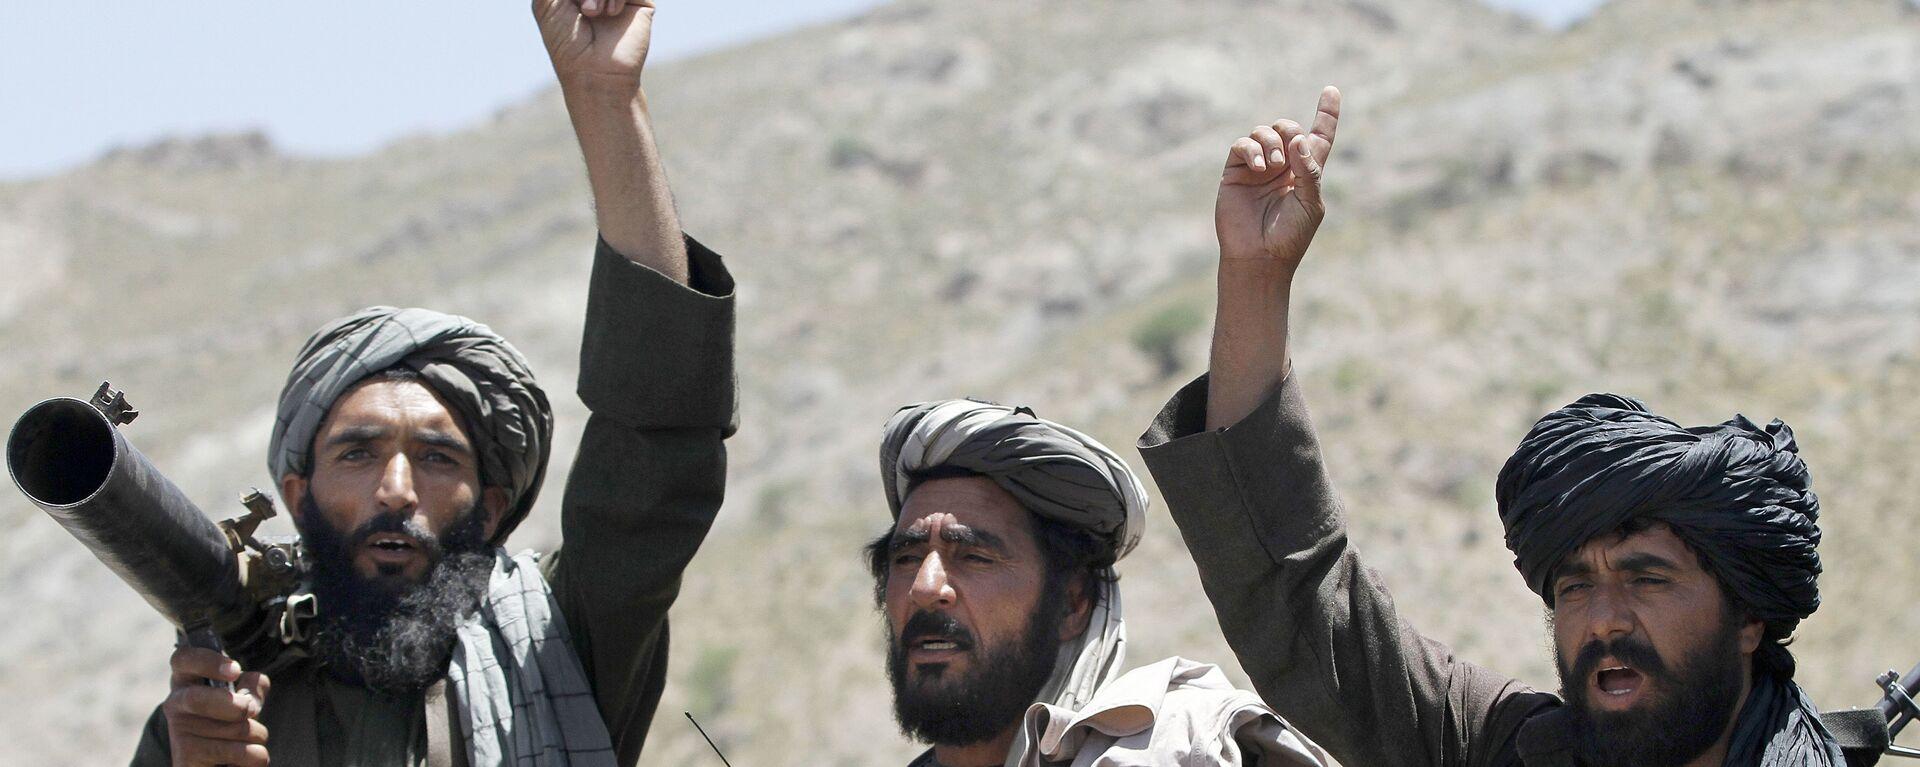 Члены движения Талибан, архивное фото - Sputnik Таджикистан, 1920, 01.06.2021